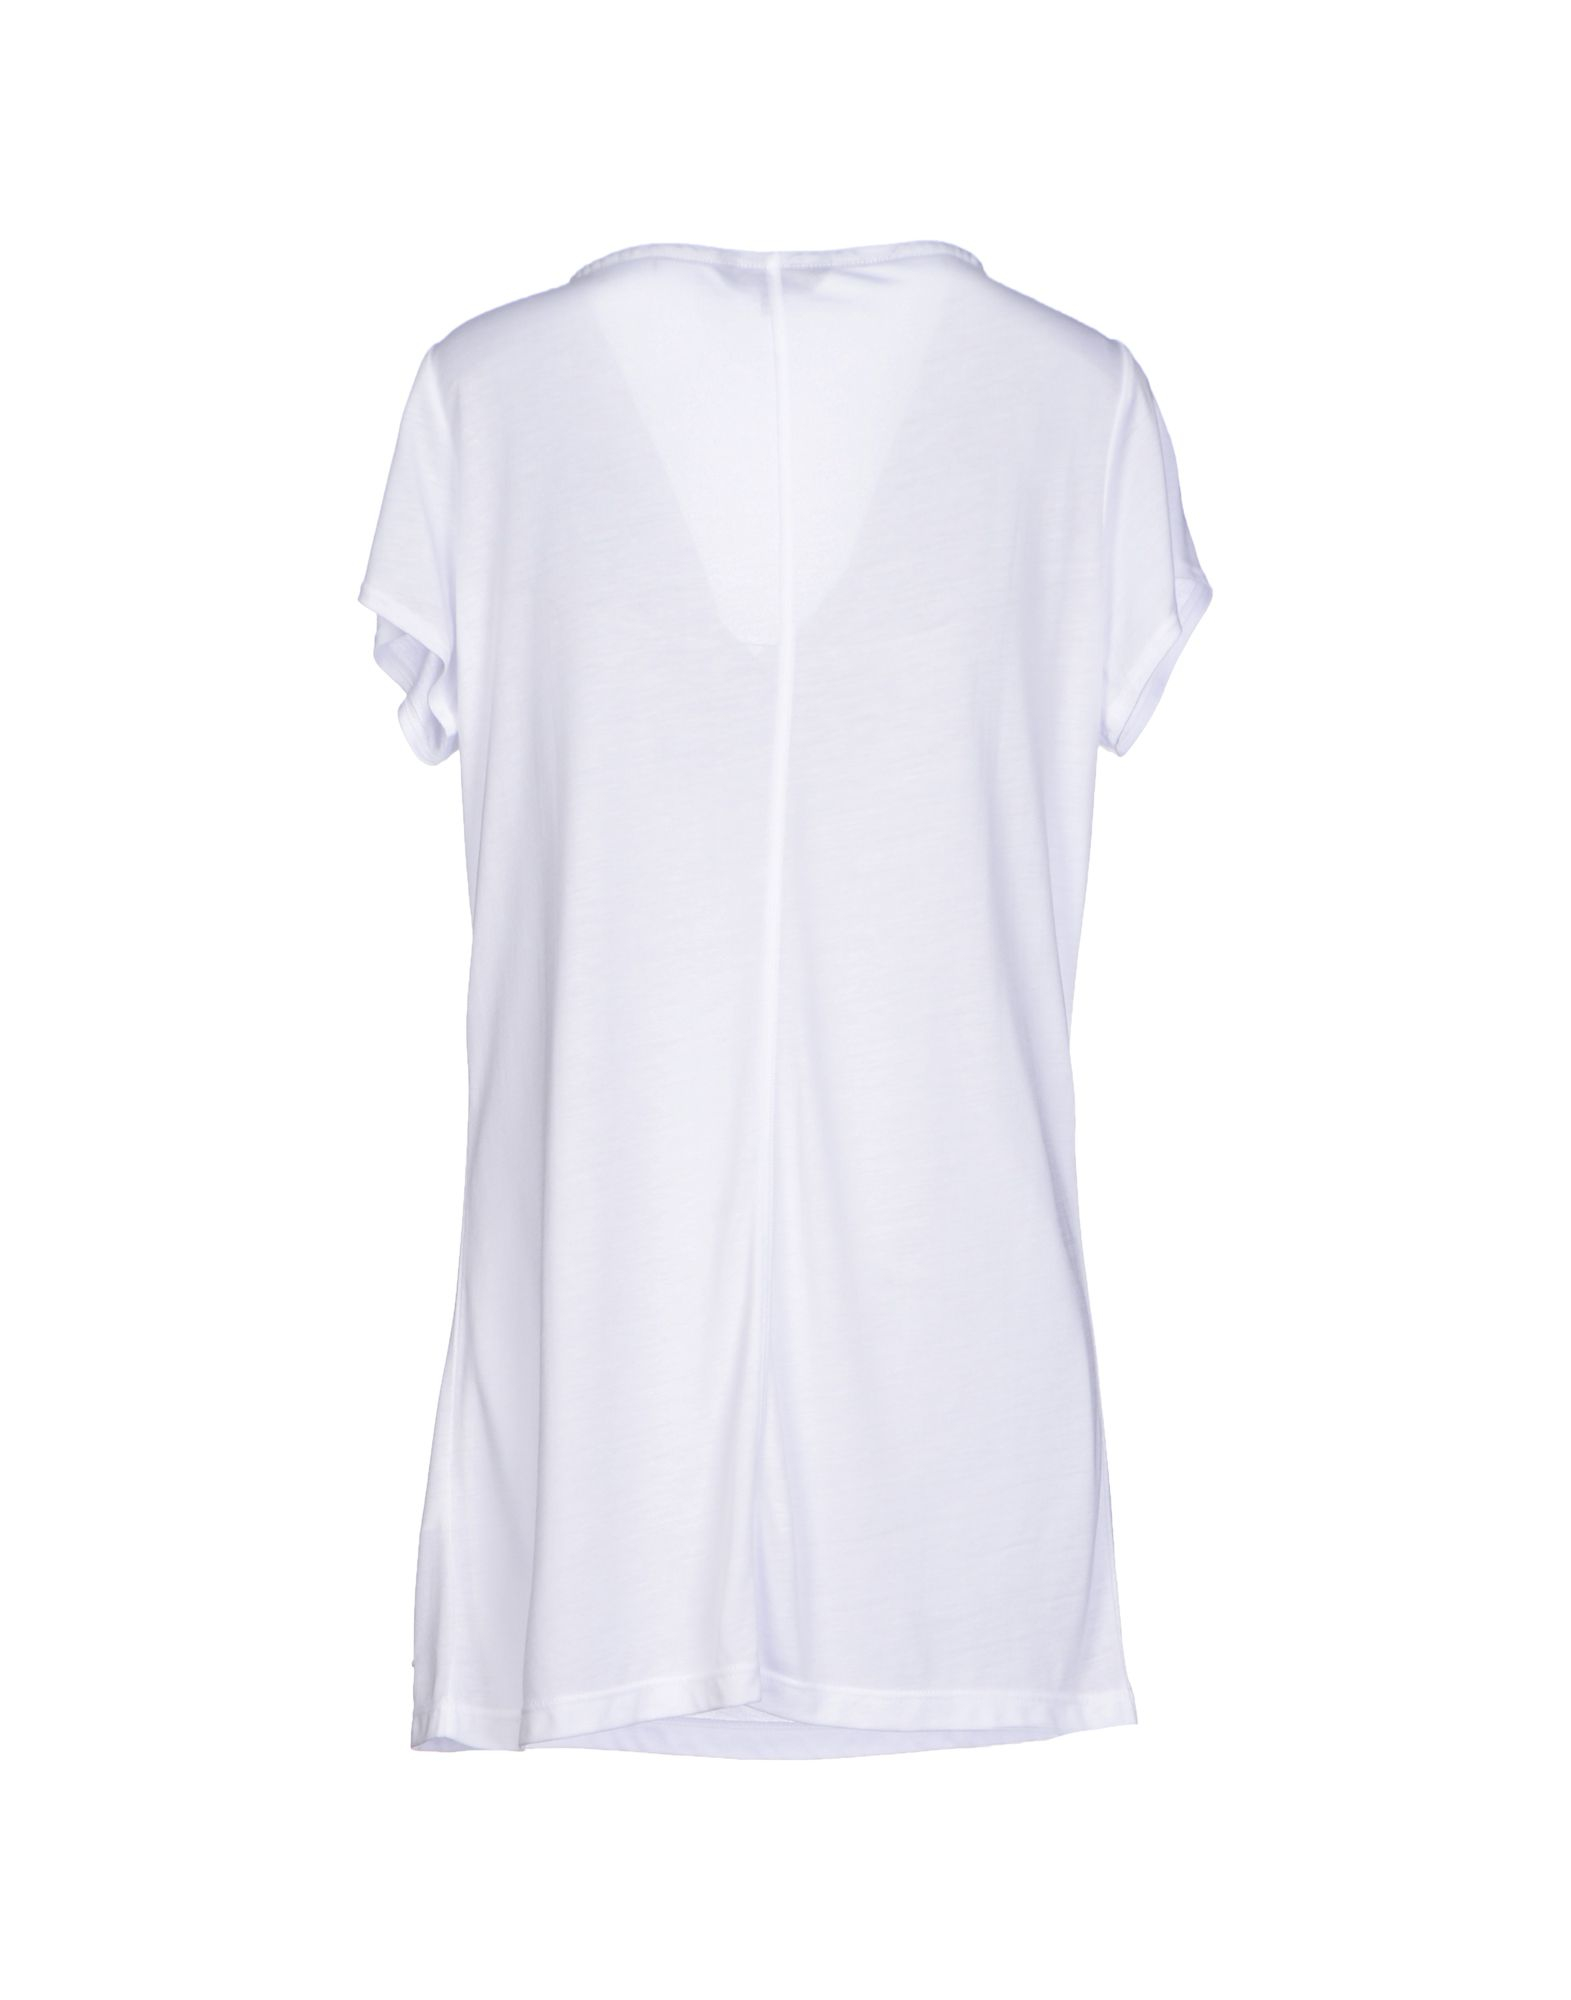 lyst tommy hilfiger t shirt in white. Black Bedroom Furniture Sets. Home Design Ideas